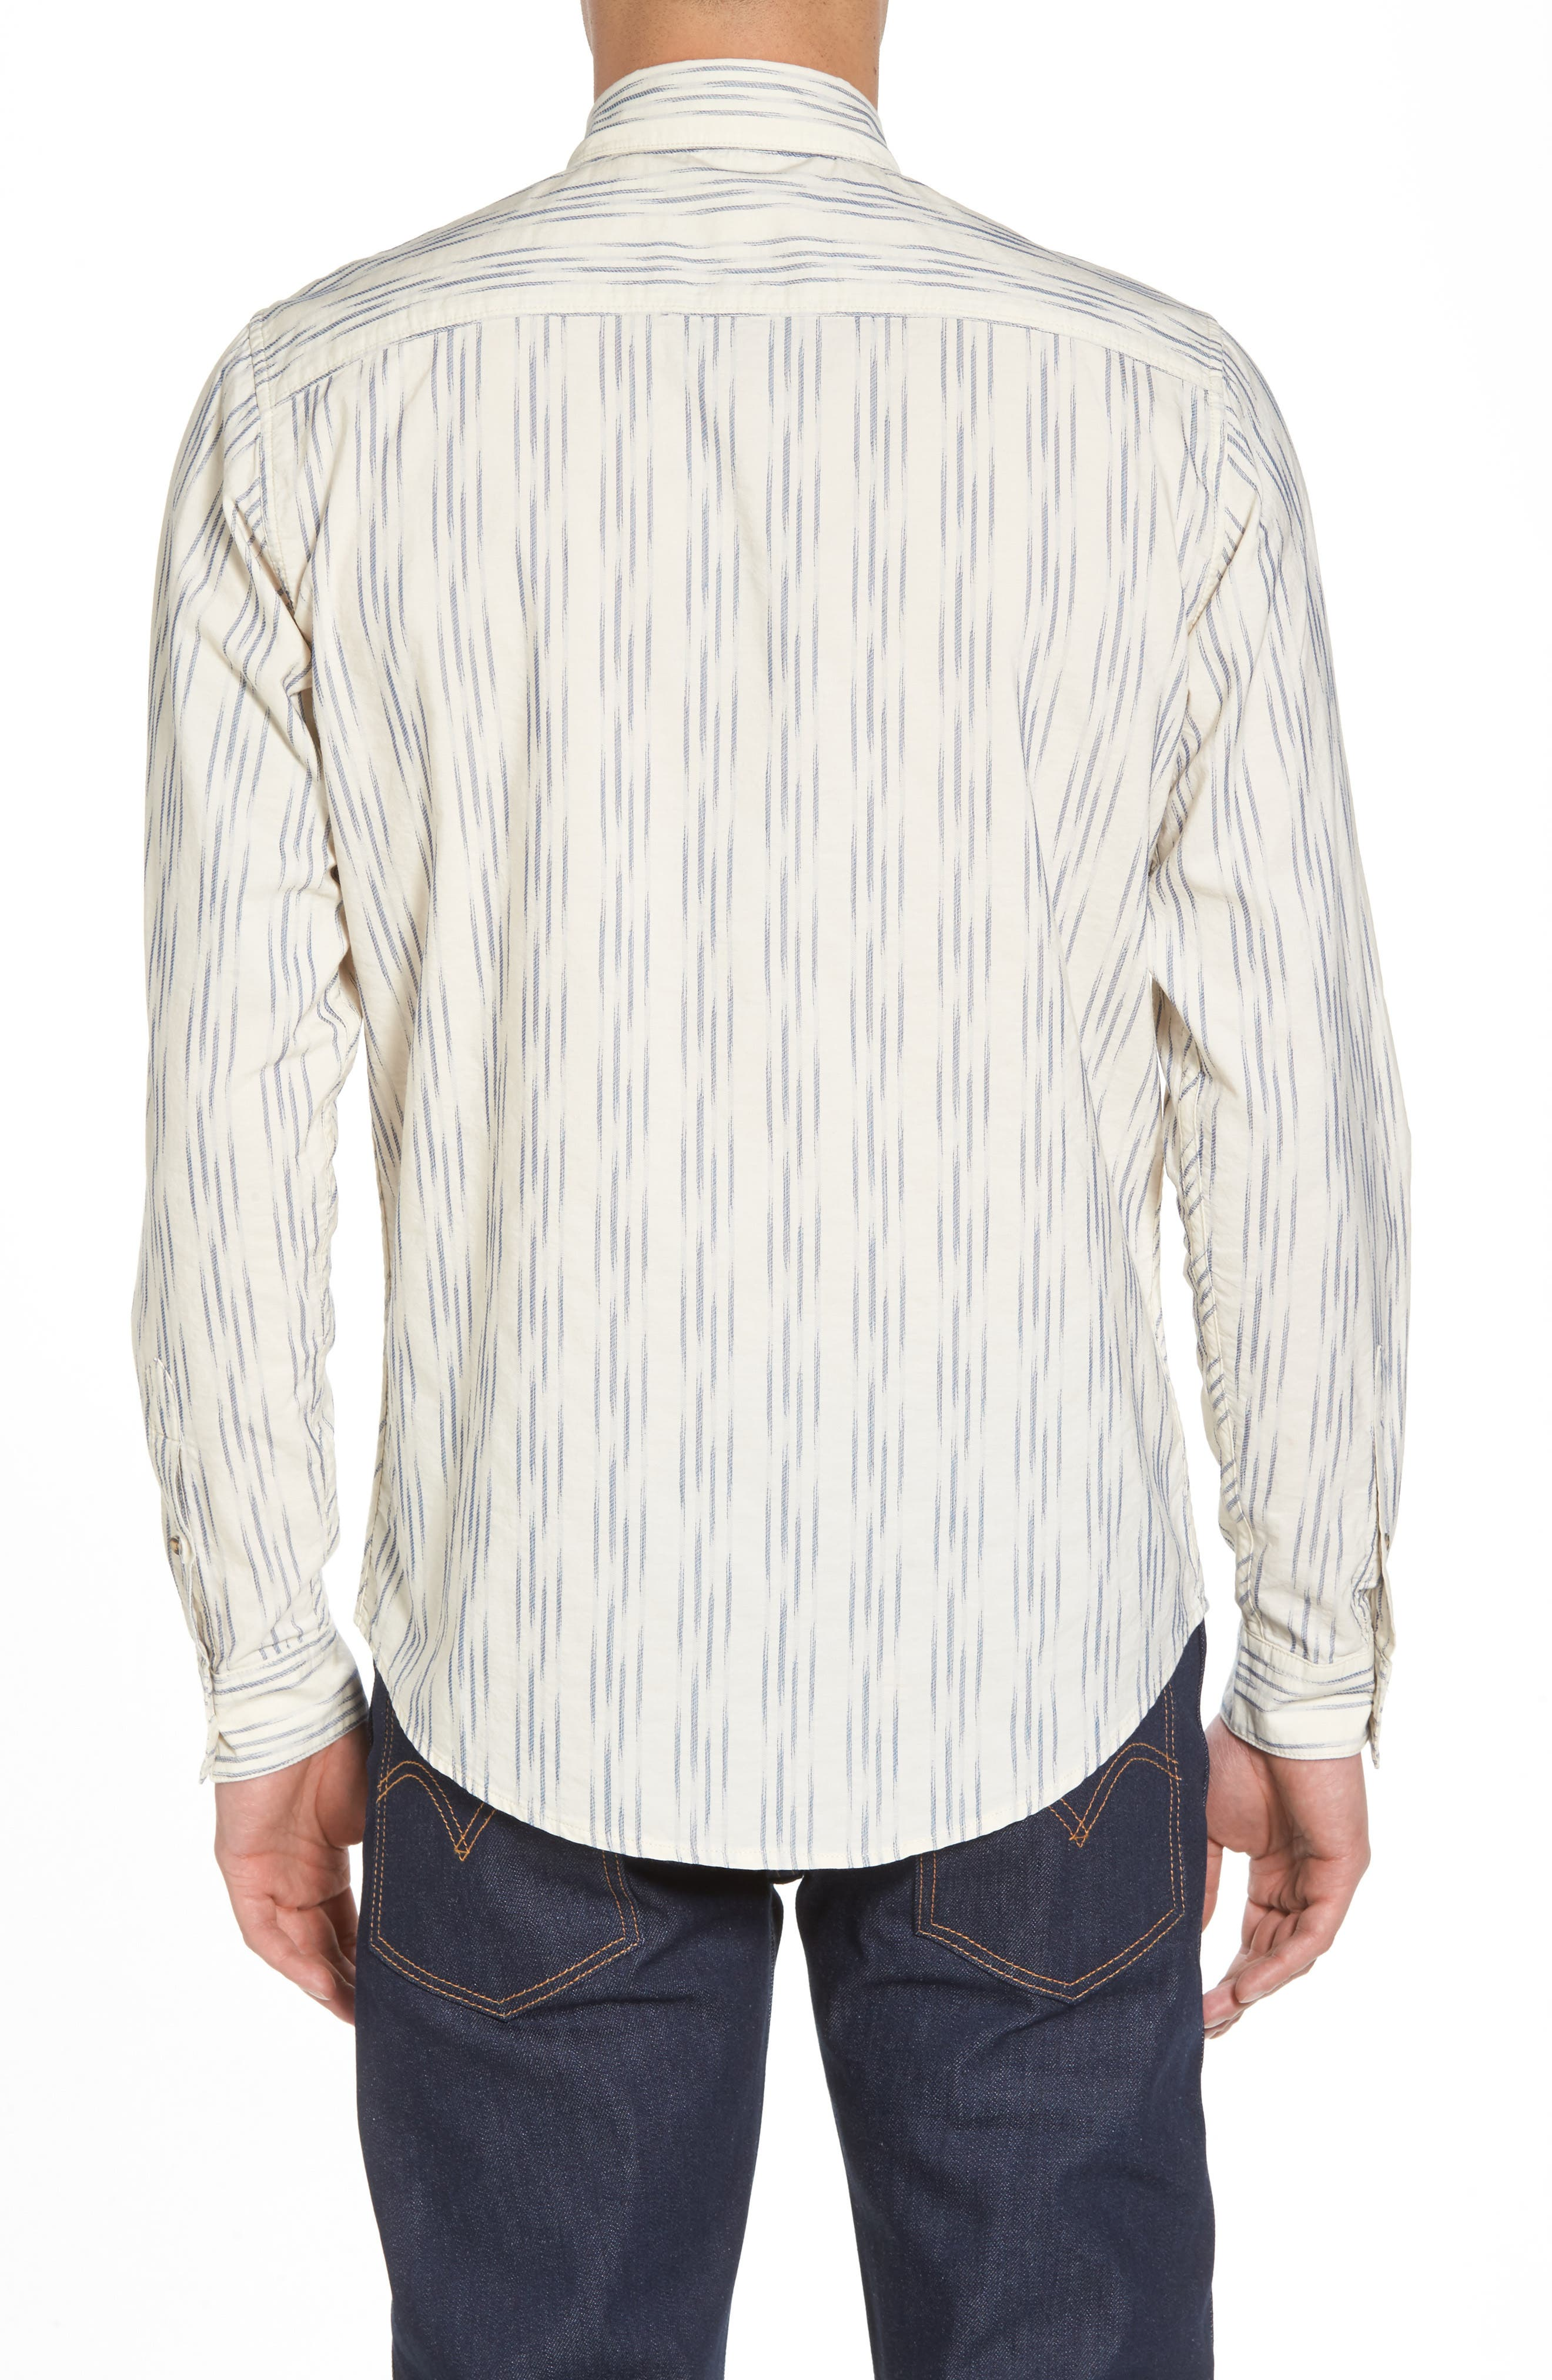 Regular Fit Sport Shirt,                             Alternate thumbnail 2, color,                             Ikat White/Blue